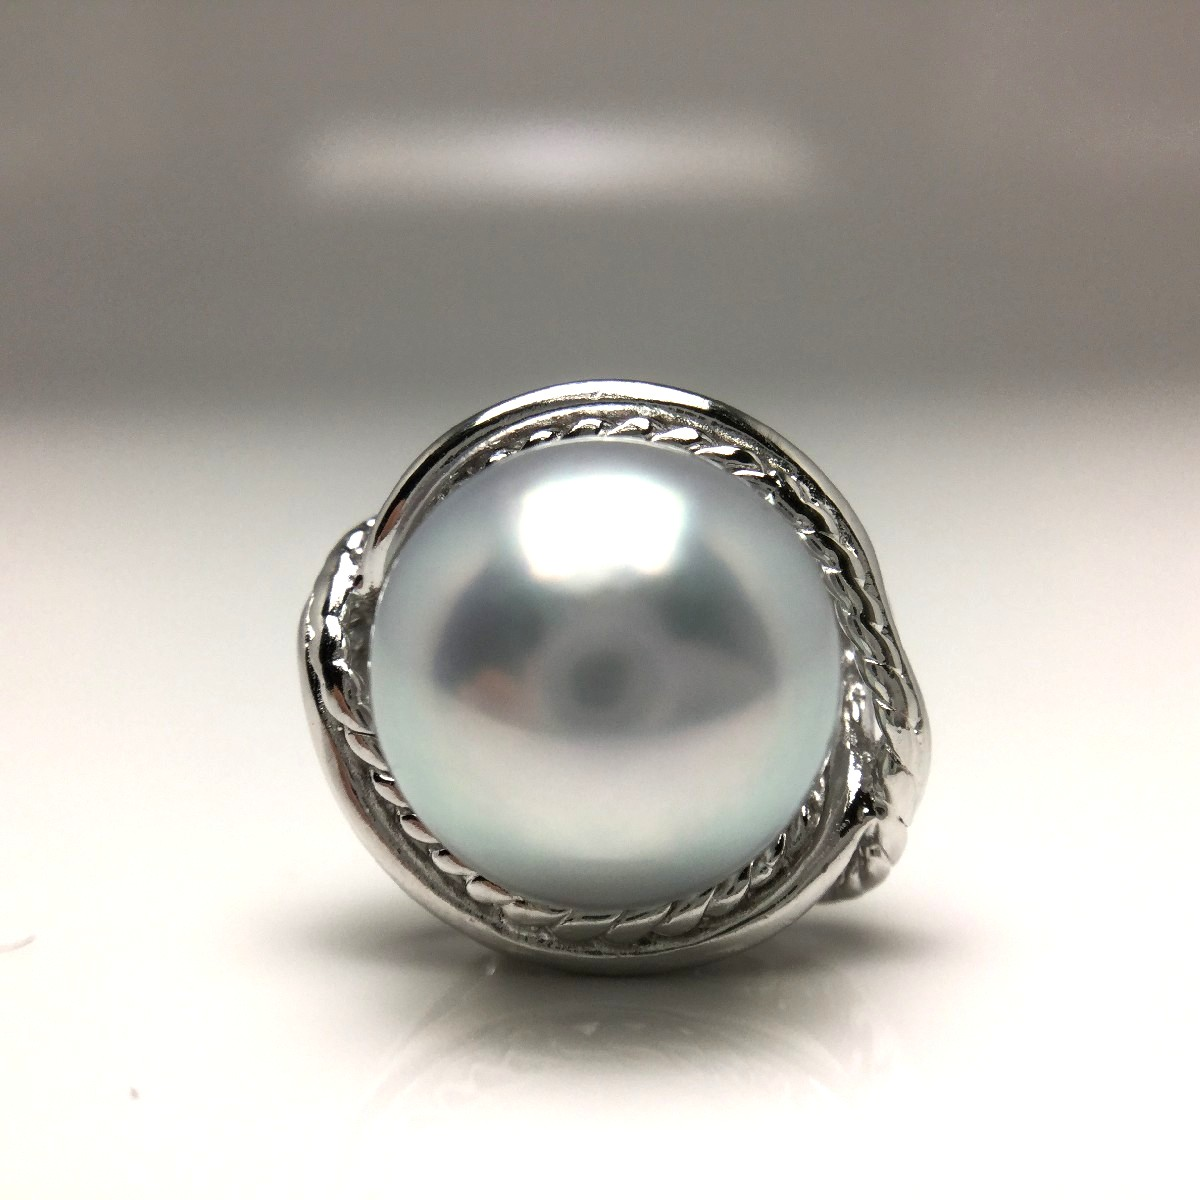 【10%OFF】真珠 ネクタイピン パール アコヤ真珠 9.07mm ホワイトシルバーブルー(ナチュラル) シルバー 65857 イソワパール